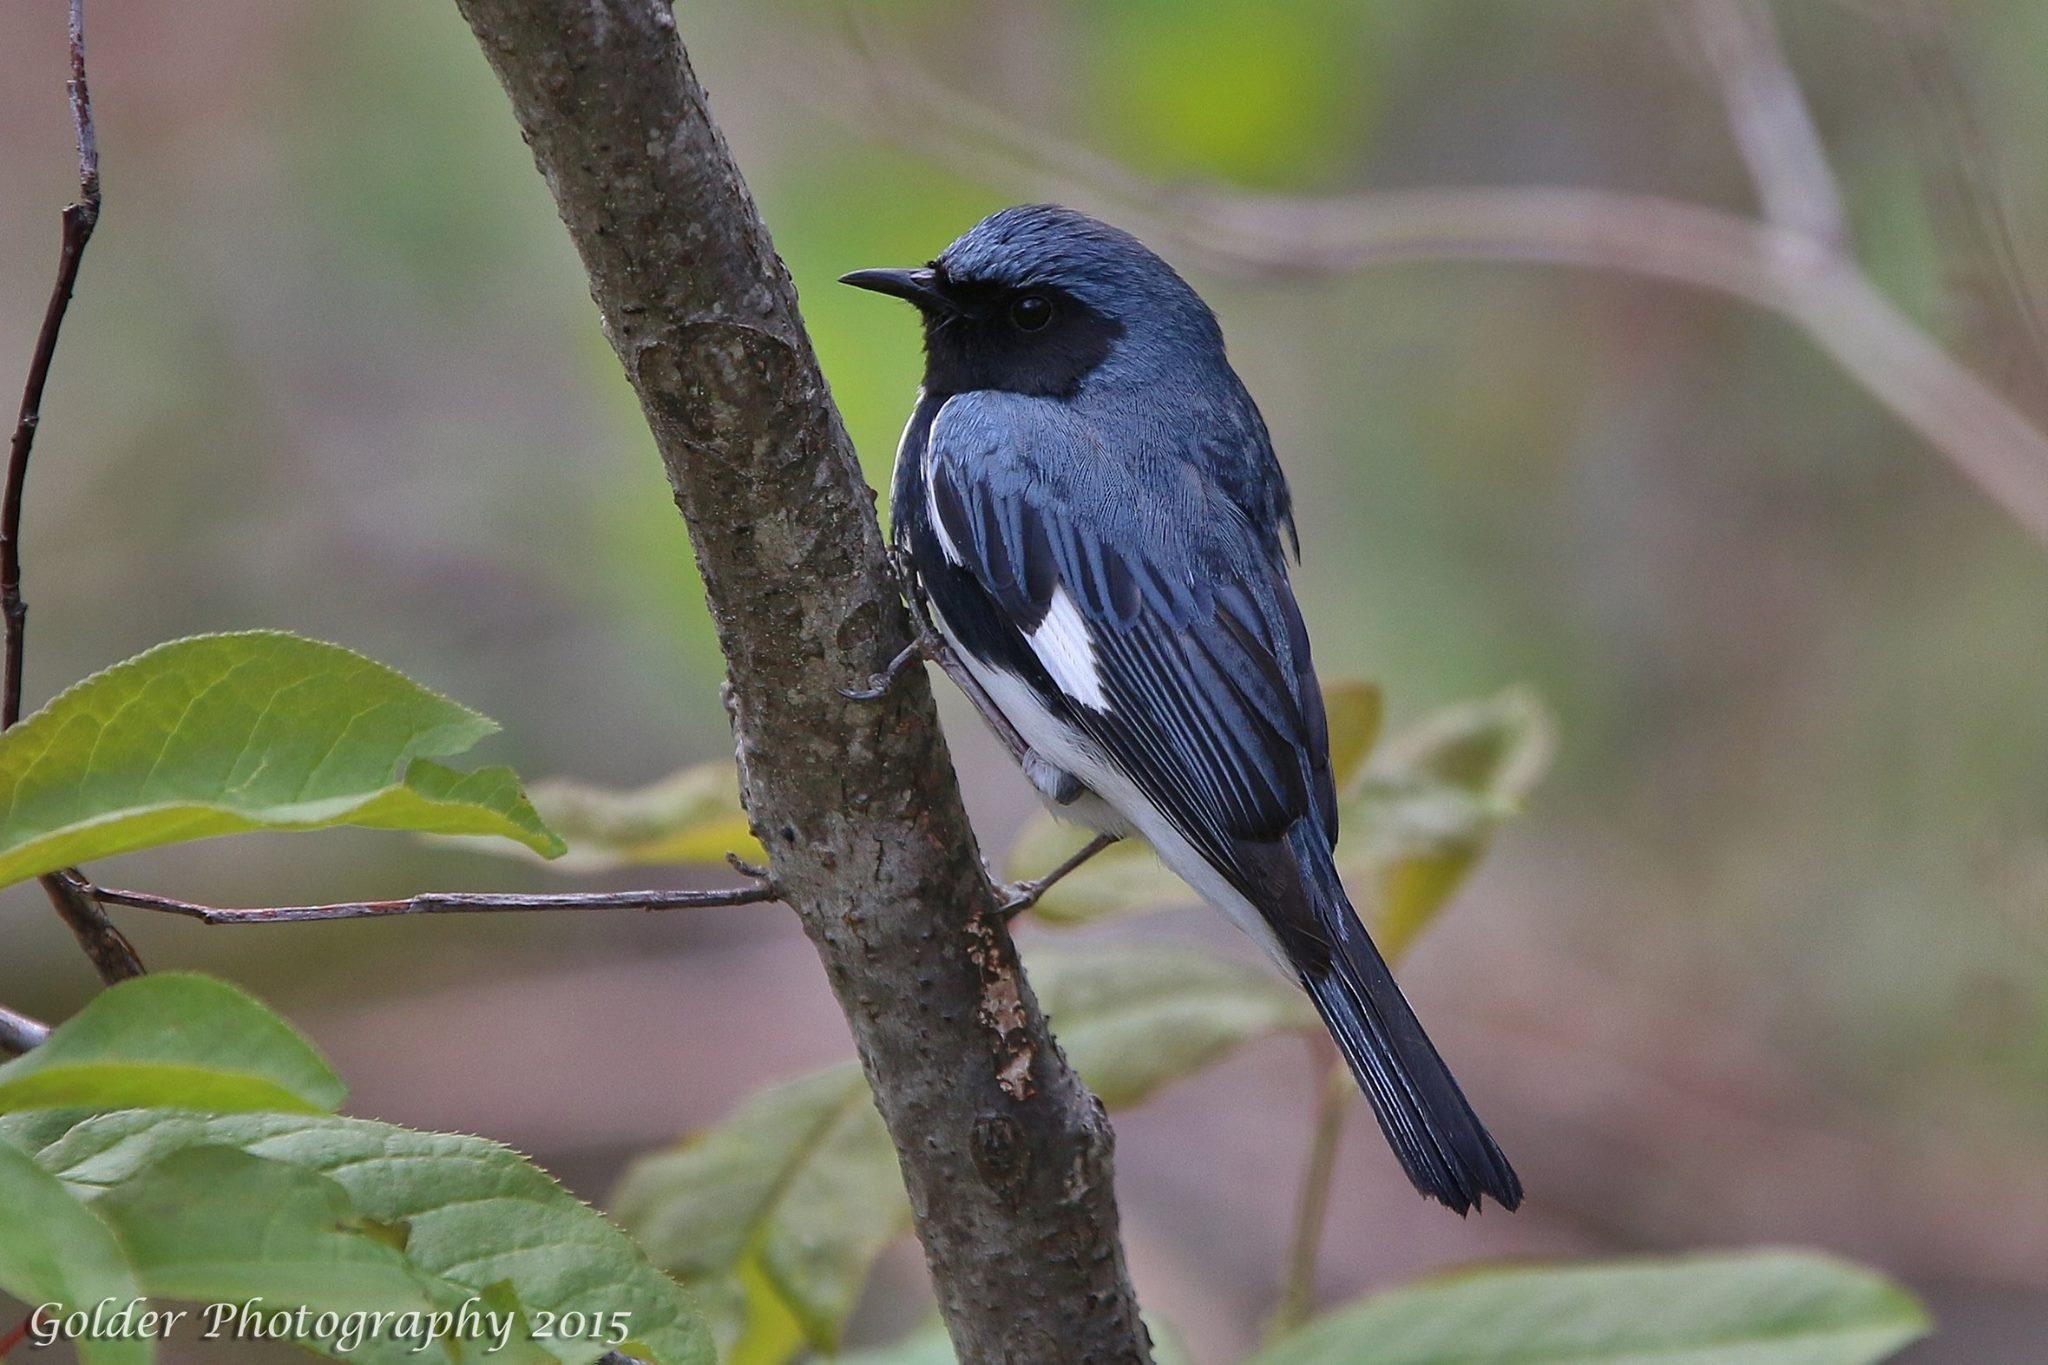 Golder Photography - Black-throated blue warbler- blue ridge parkway virgina jefferson national forest